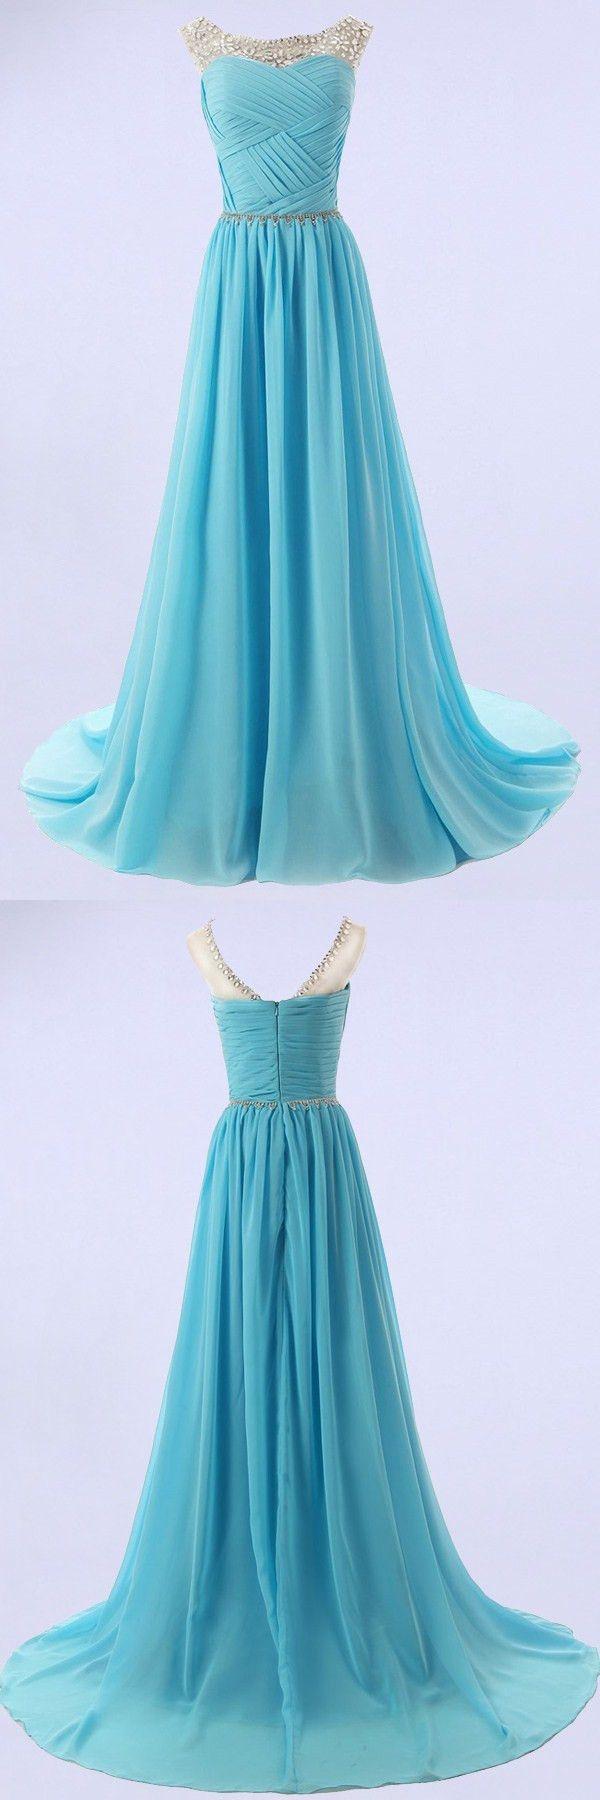 bridesmaid dresses,cheap bridesmaid dresses,sky blue bridesmaid dresses,sweep train bridesmaid dresses,evening party dresses,cheap blue evening party dresses,sweep train blue prom dresses